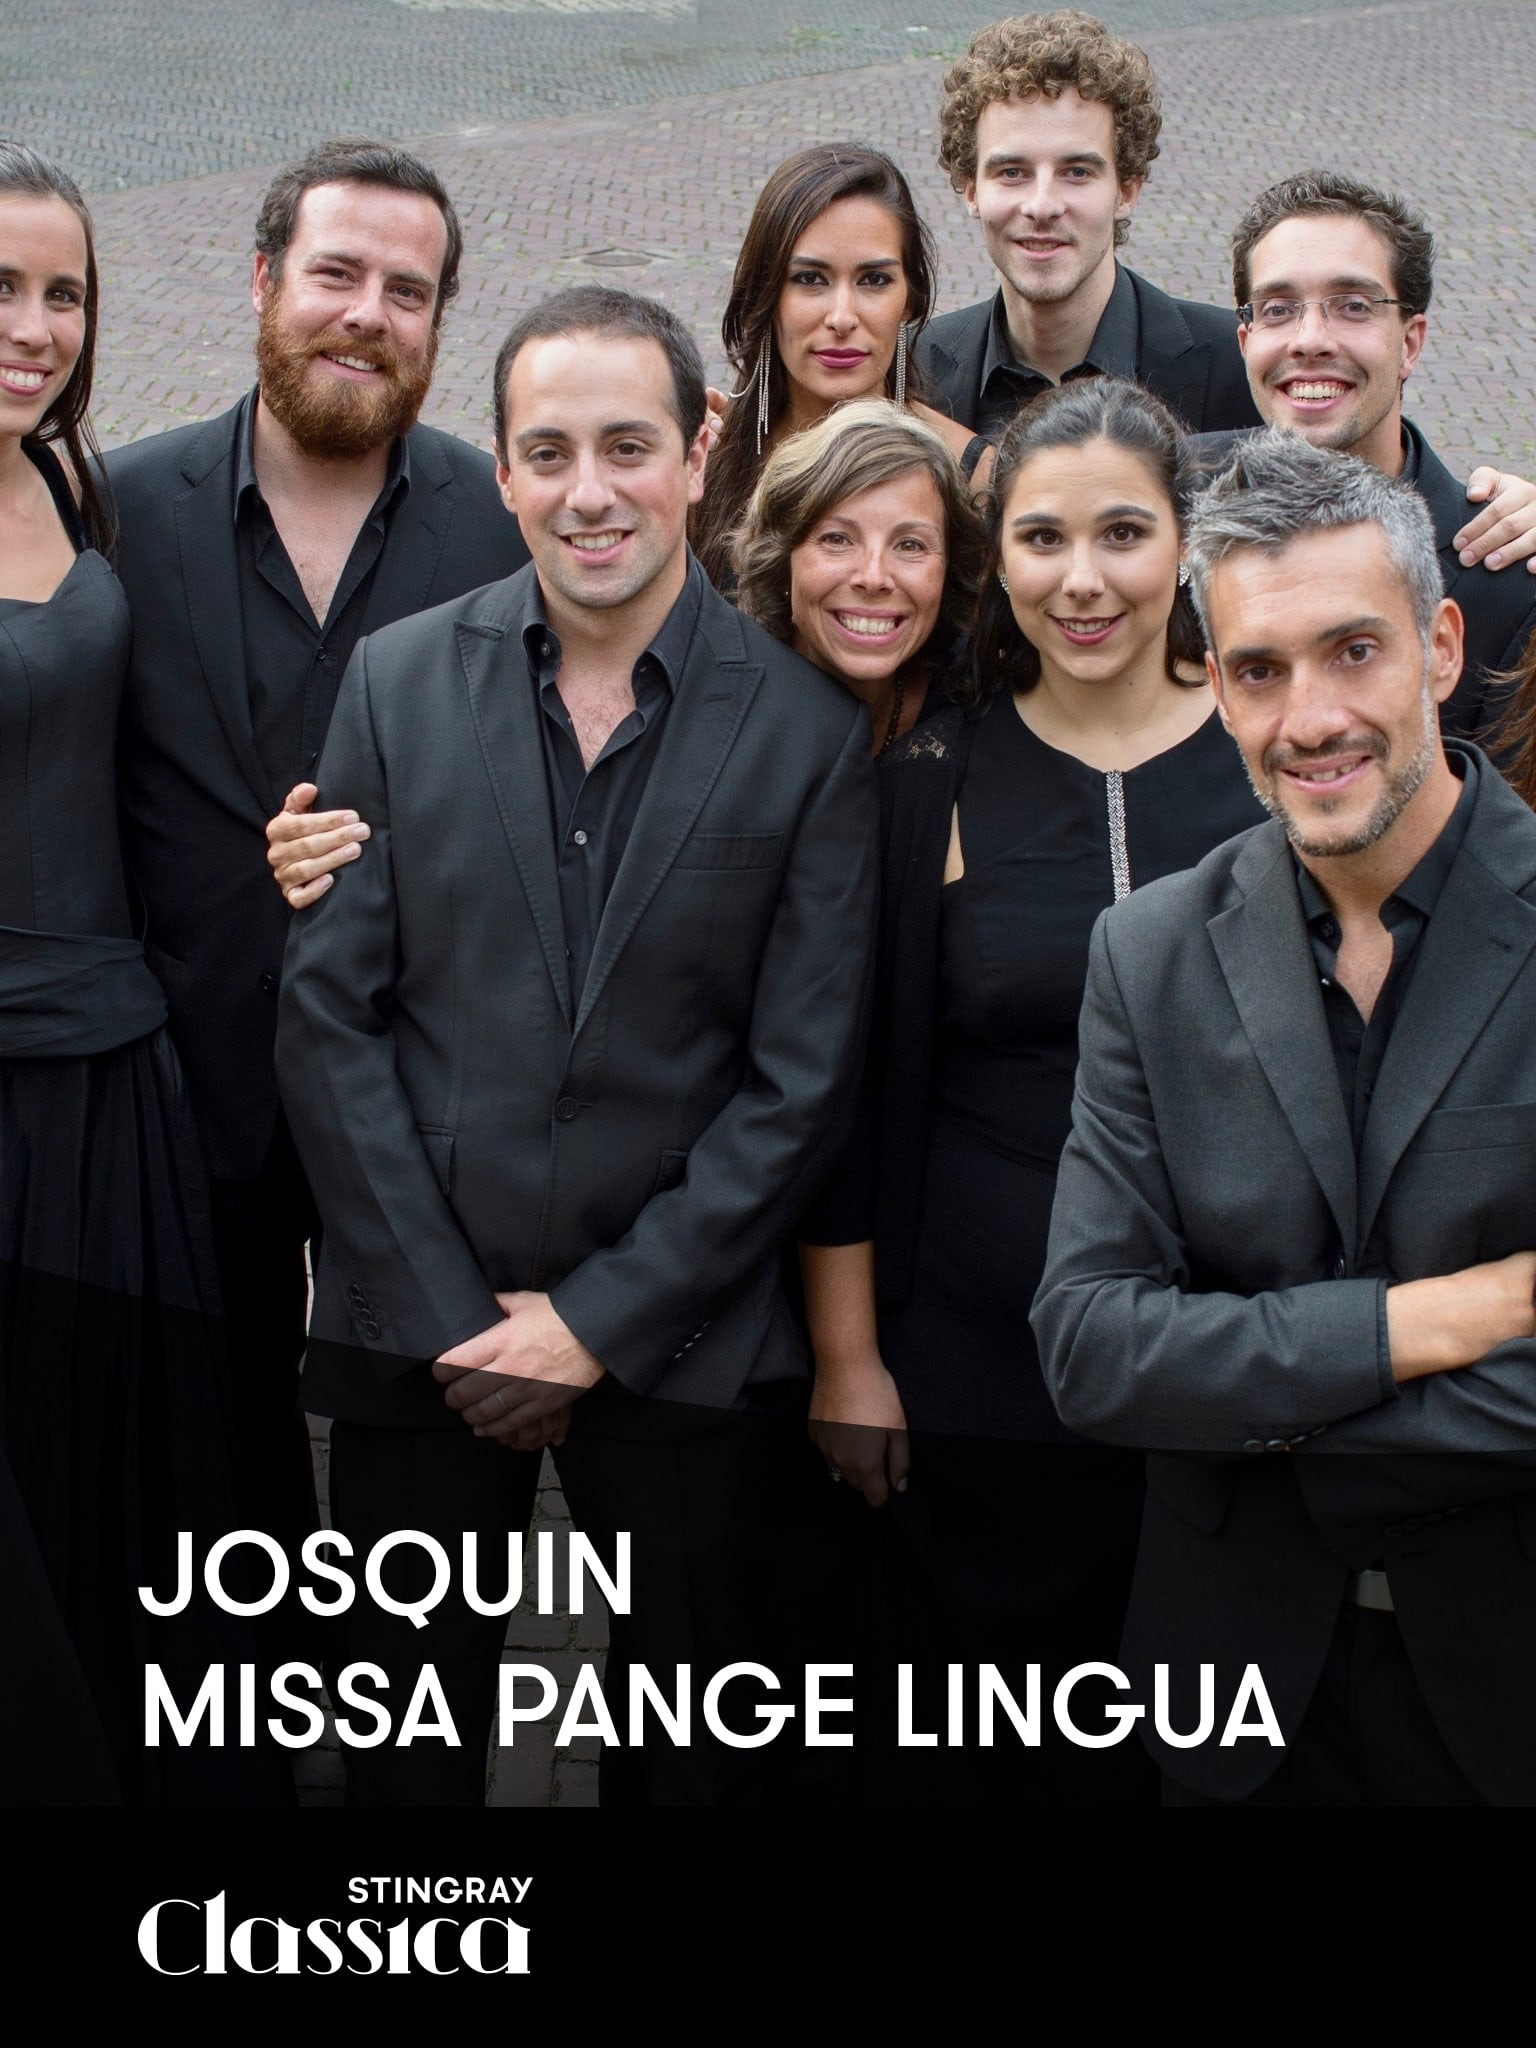 Josquin - Missa Pange Lingua